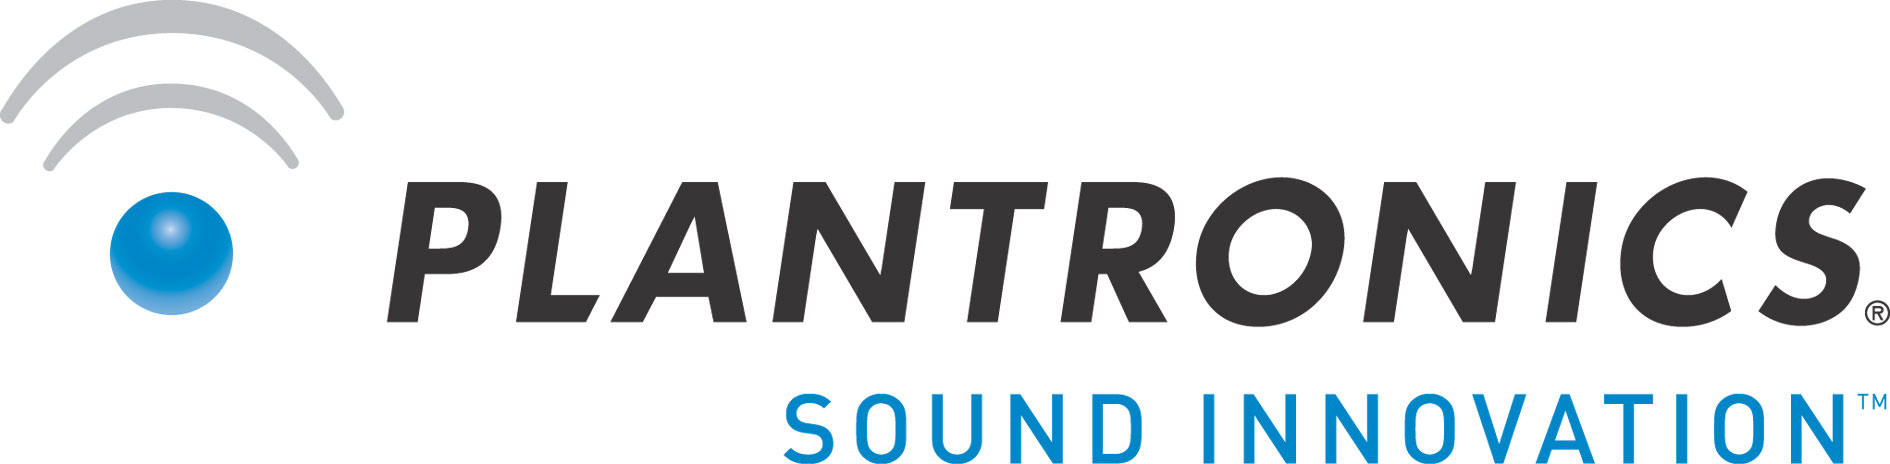 plantronics-logo.jpg